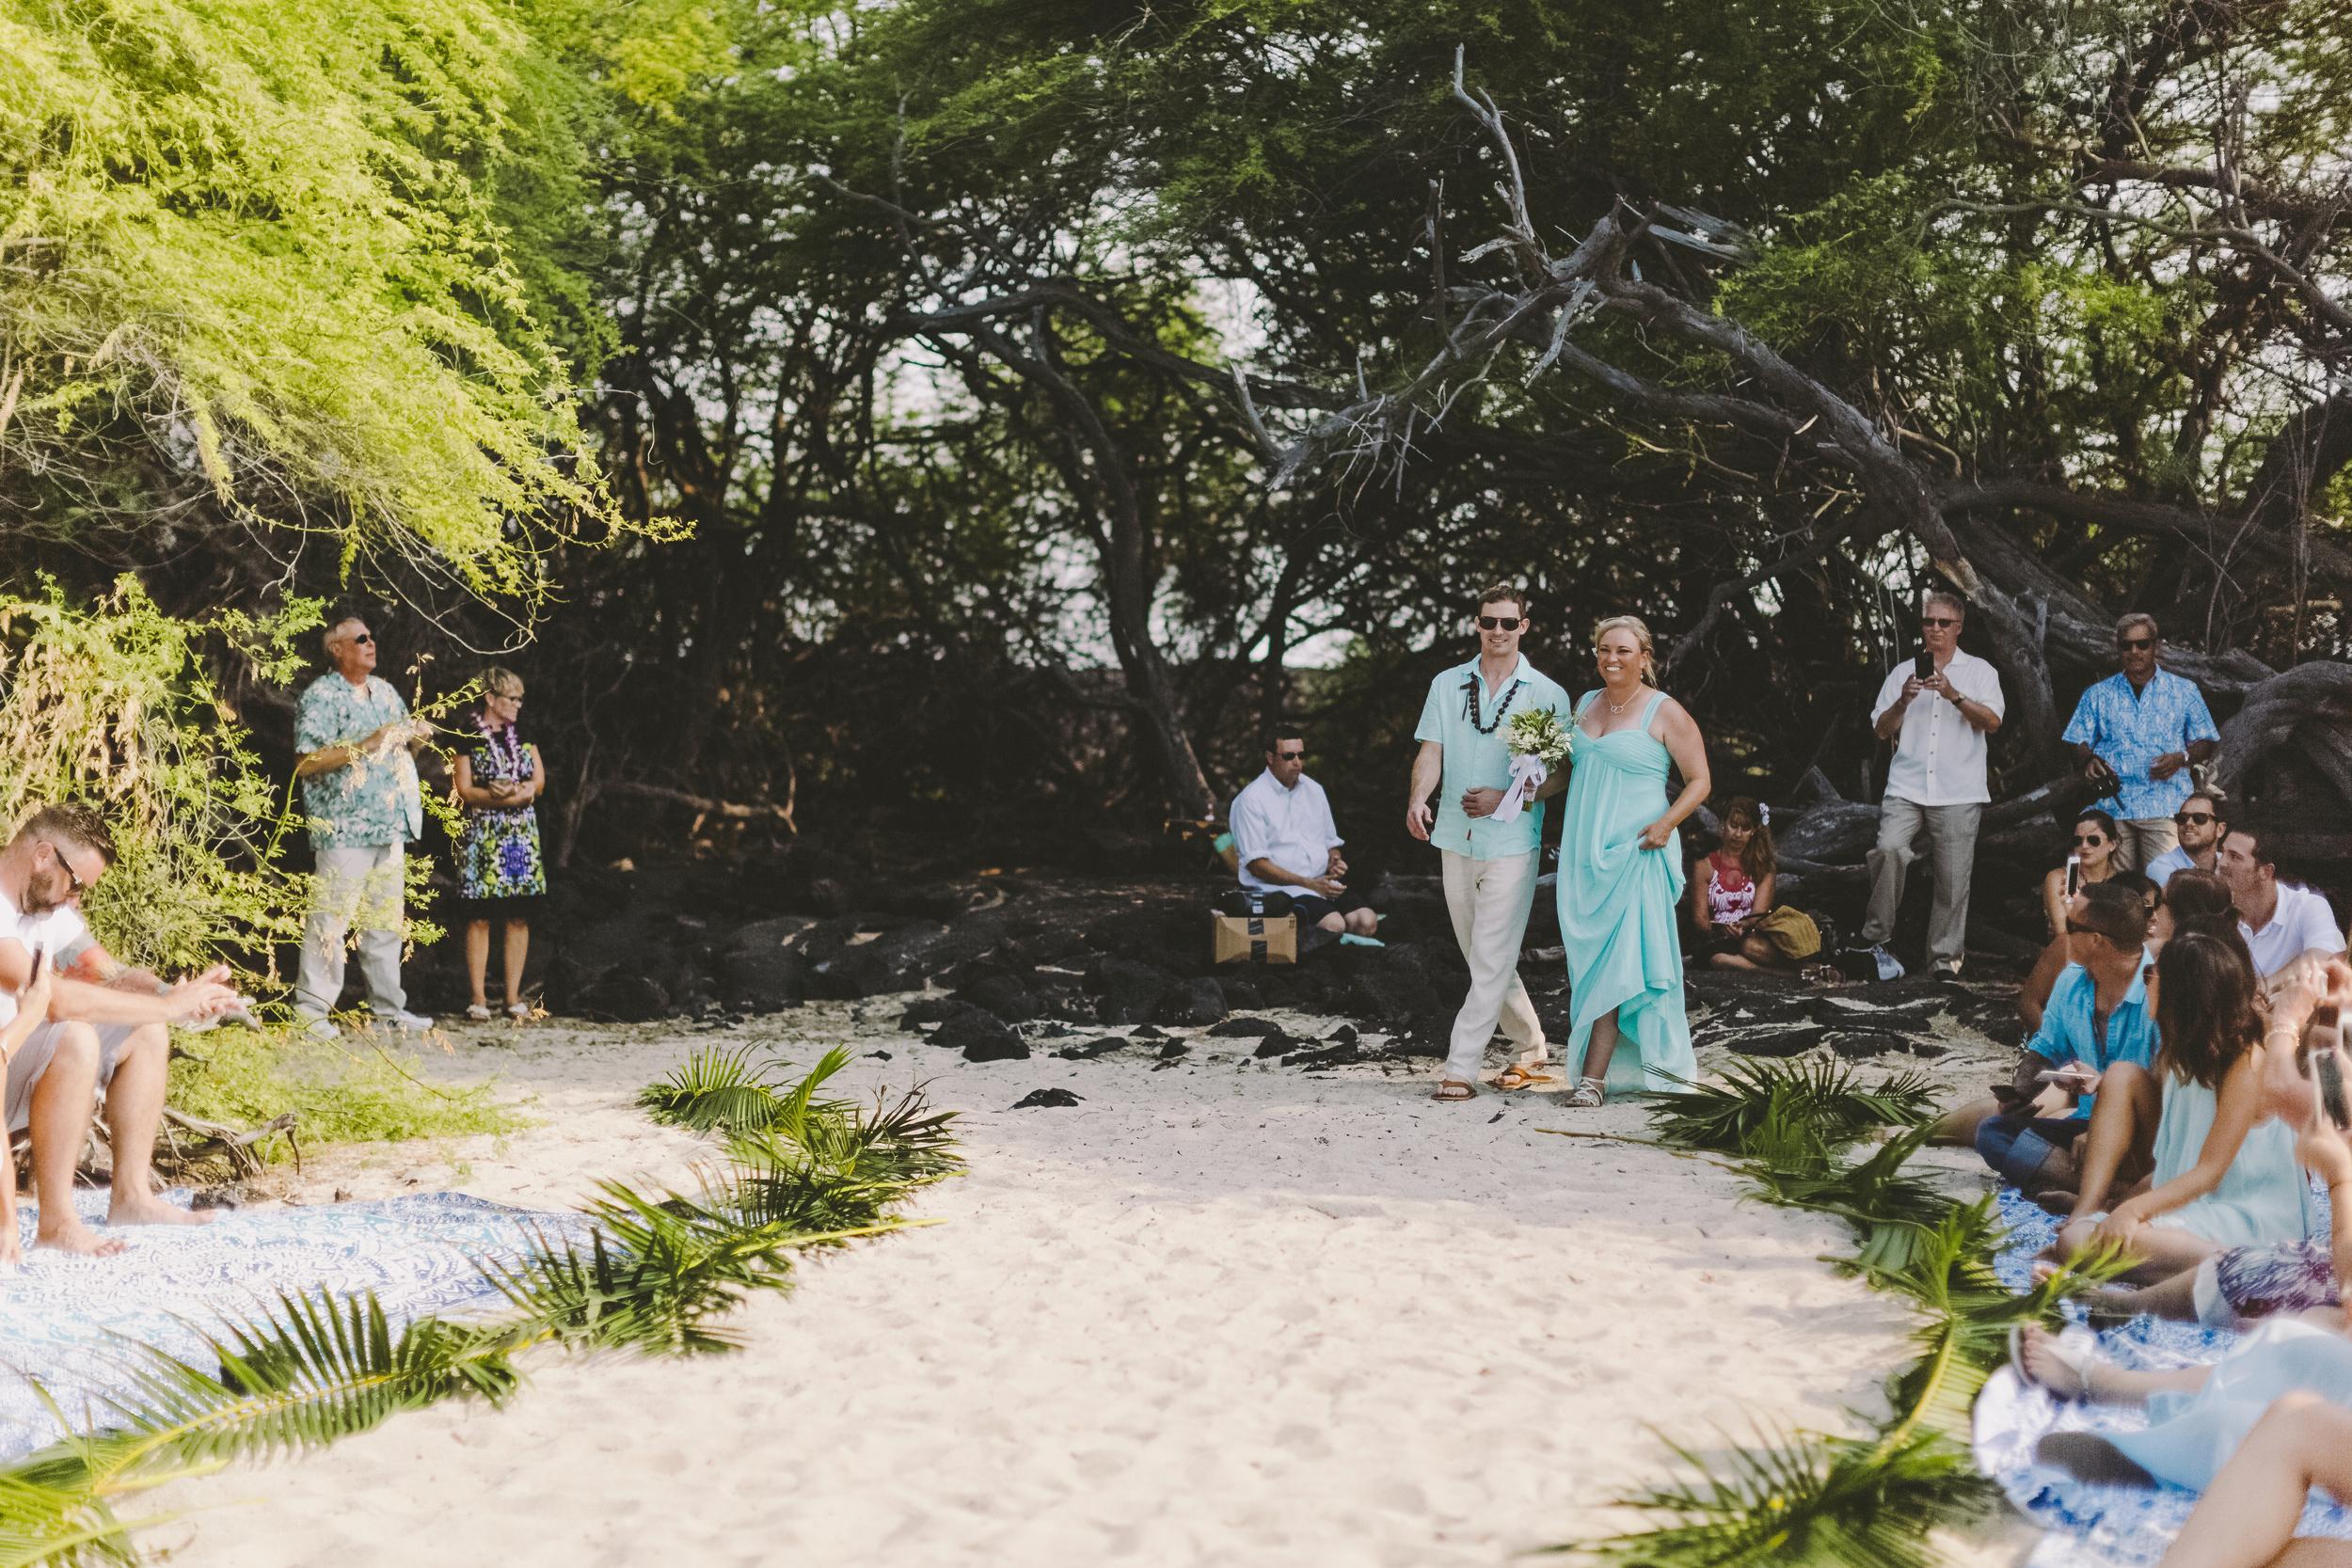 angie-diaz-photography-hawaii-wedding-photographer-kelli-jay-49.jpg